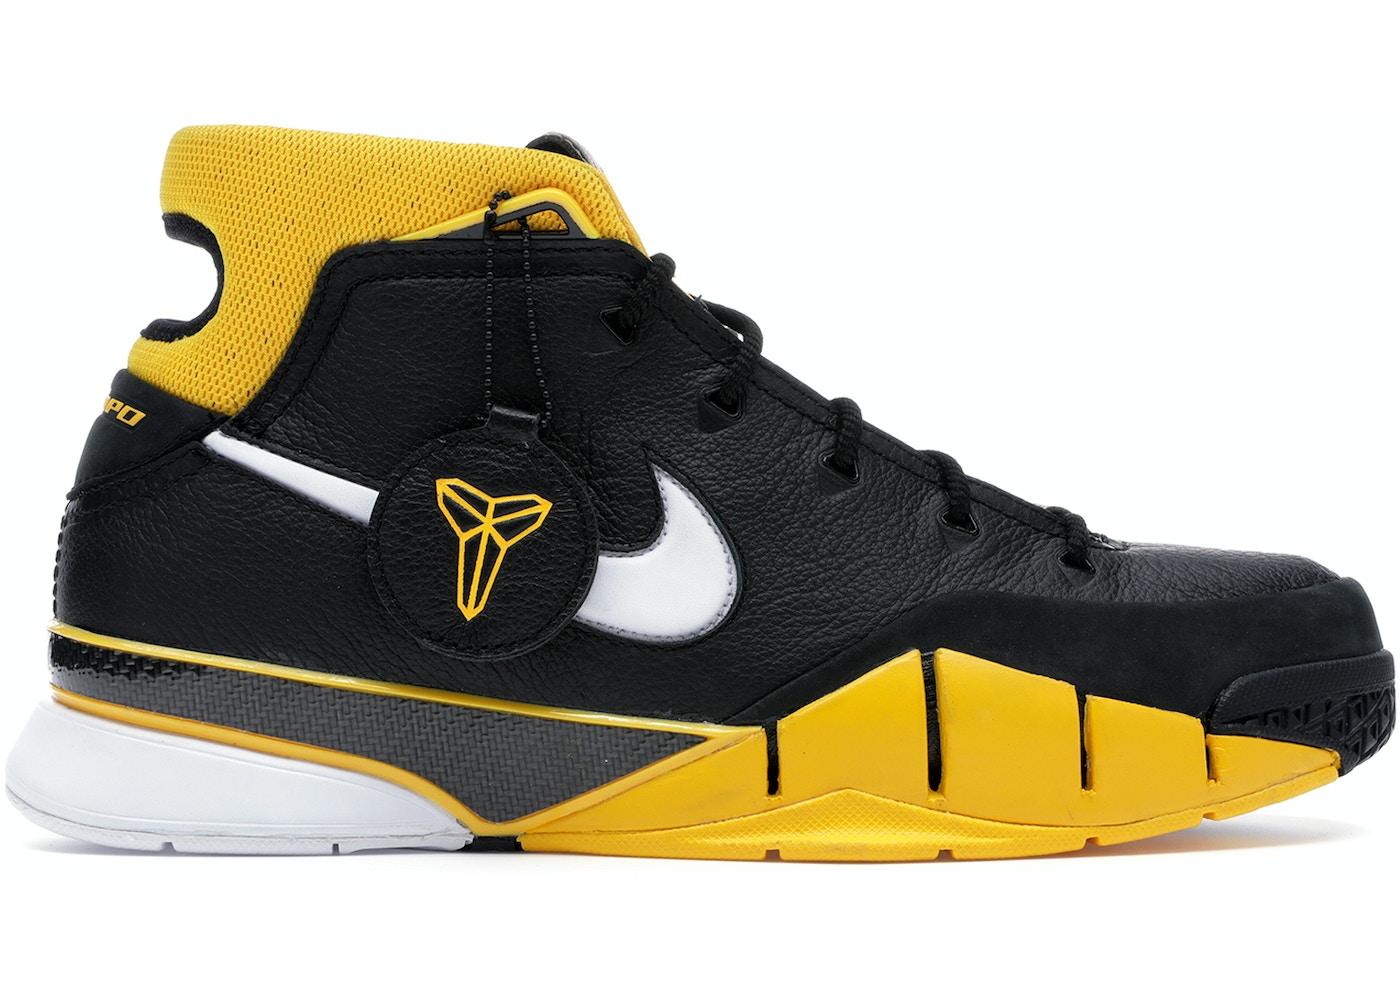 65bfdd0dbbc Buy Nike Kobe Shoes   Deadstock Sneakers